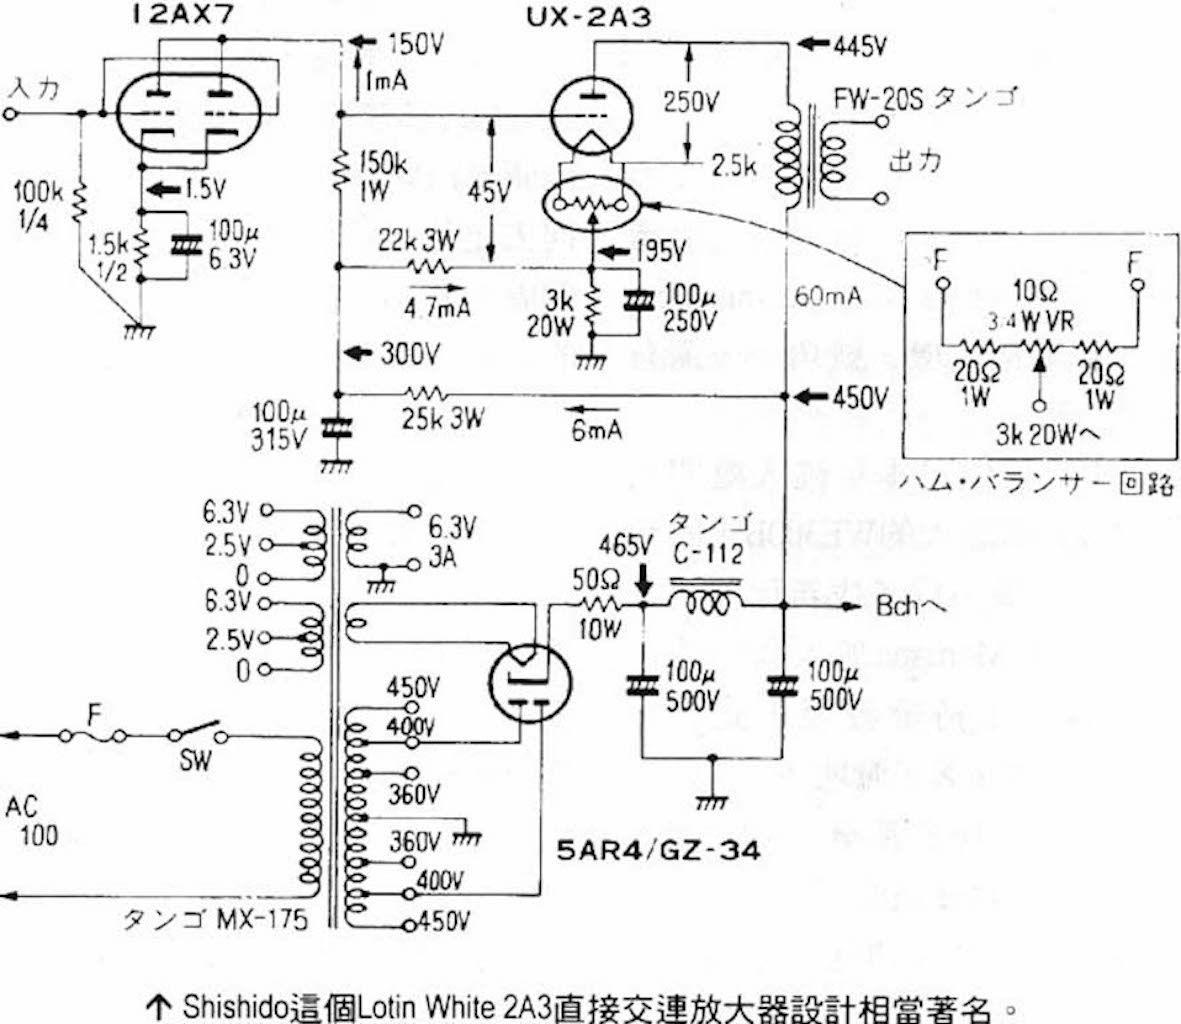 Shishido 2a3 Schematic Amp Tube Math Equations